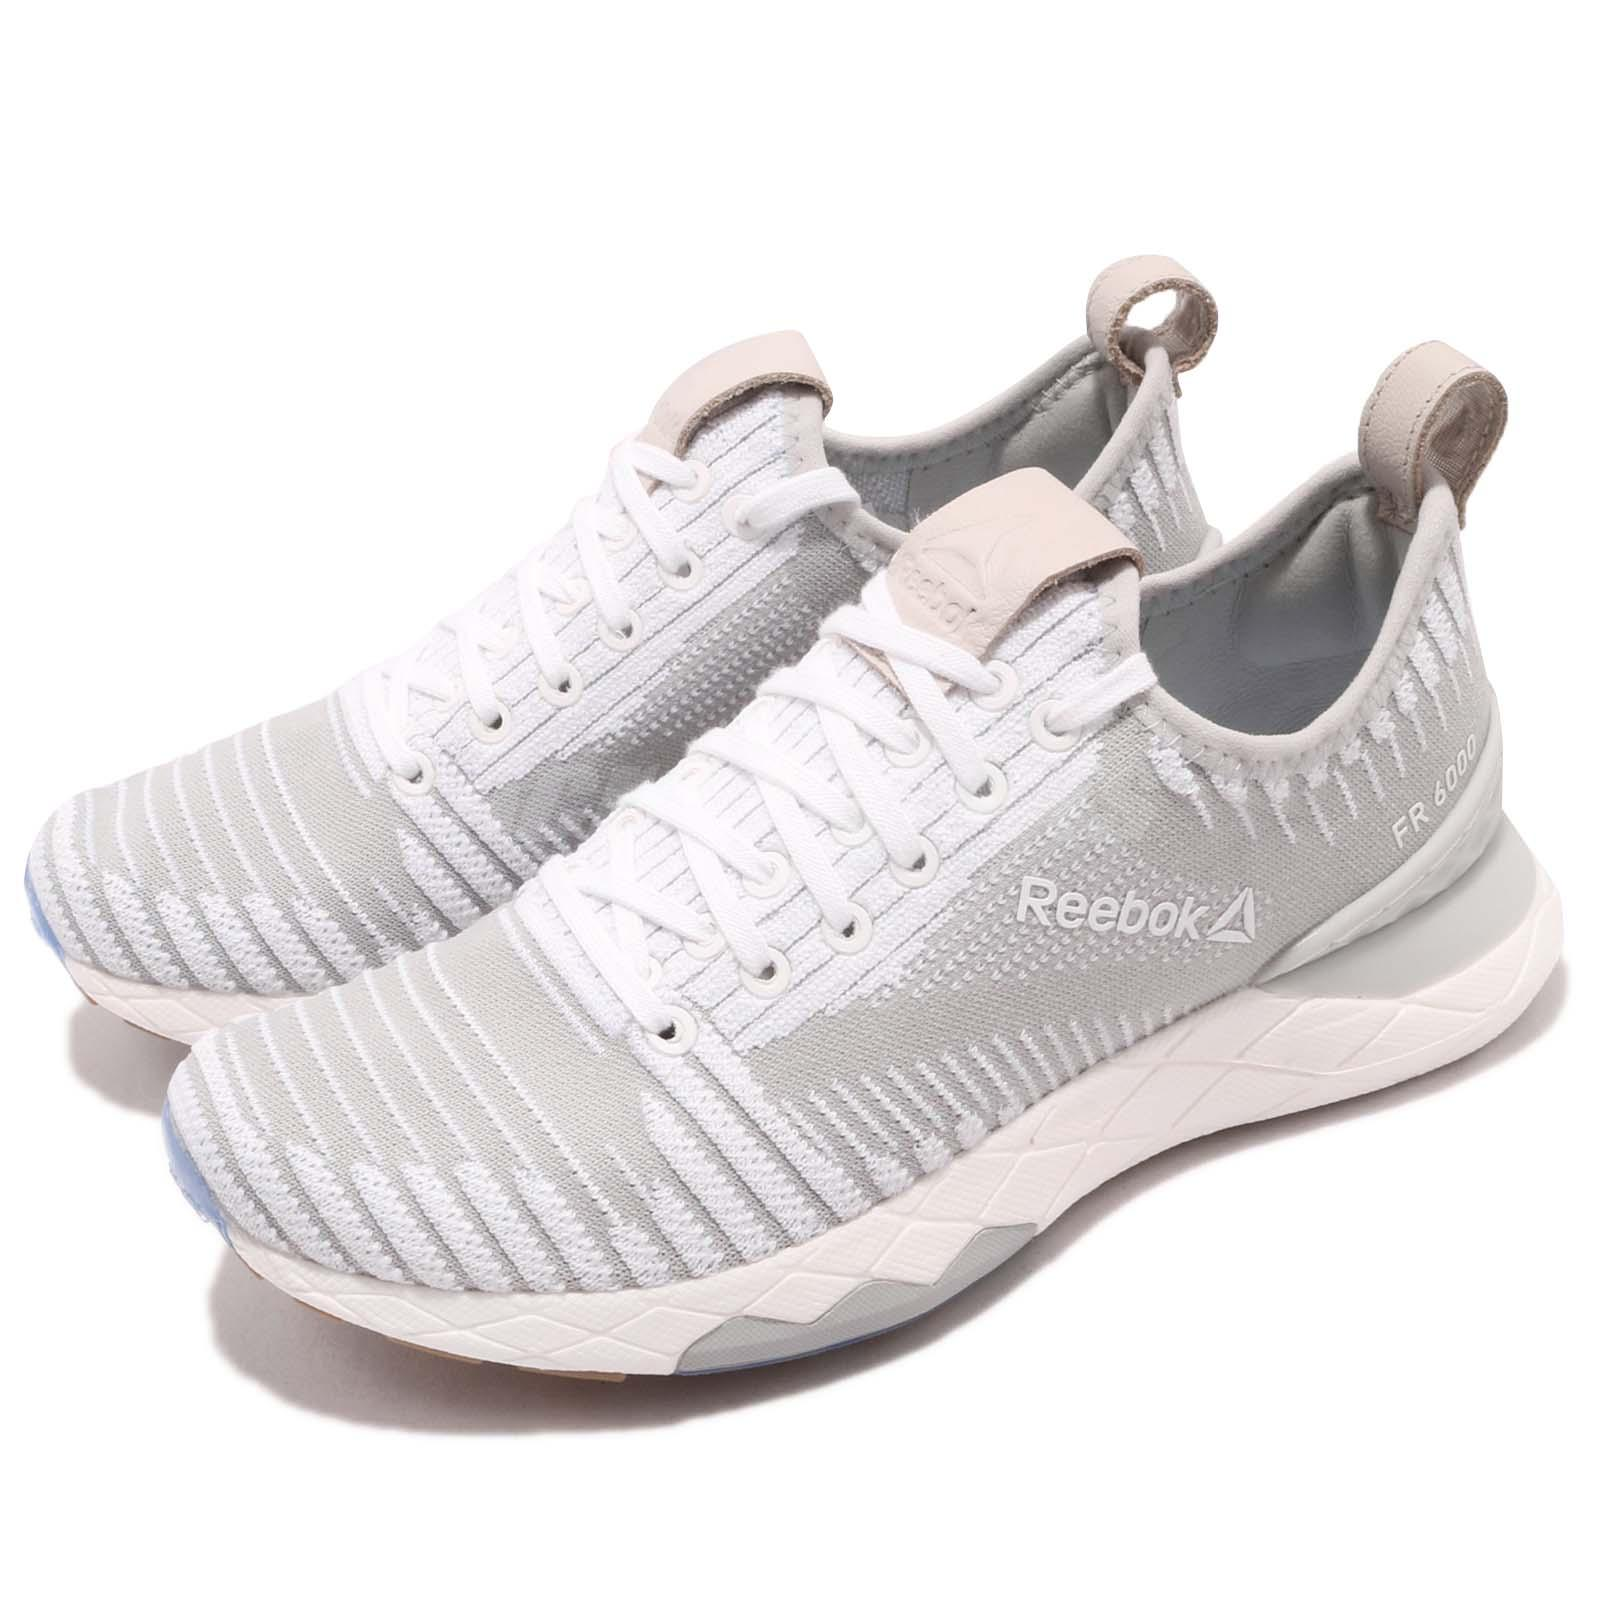 Details about Reebok Floatride 6000 Ultraknit White Grey Stucco Women  Running Shoes CN1763 d86aaa4c1